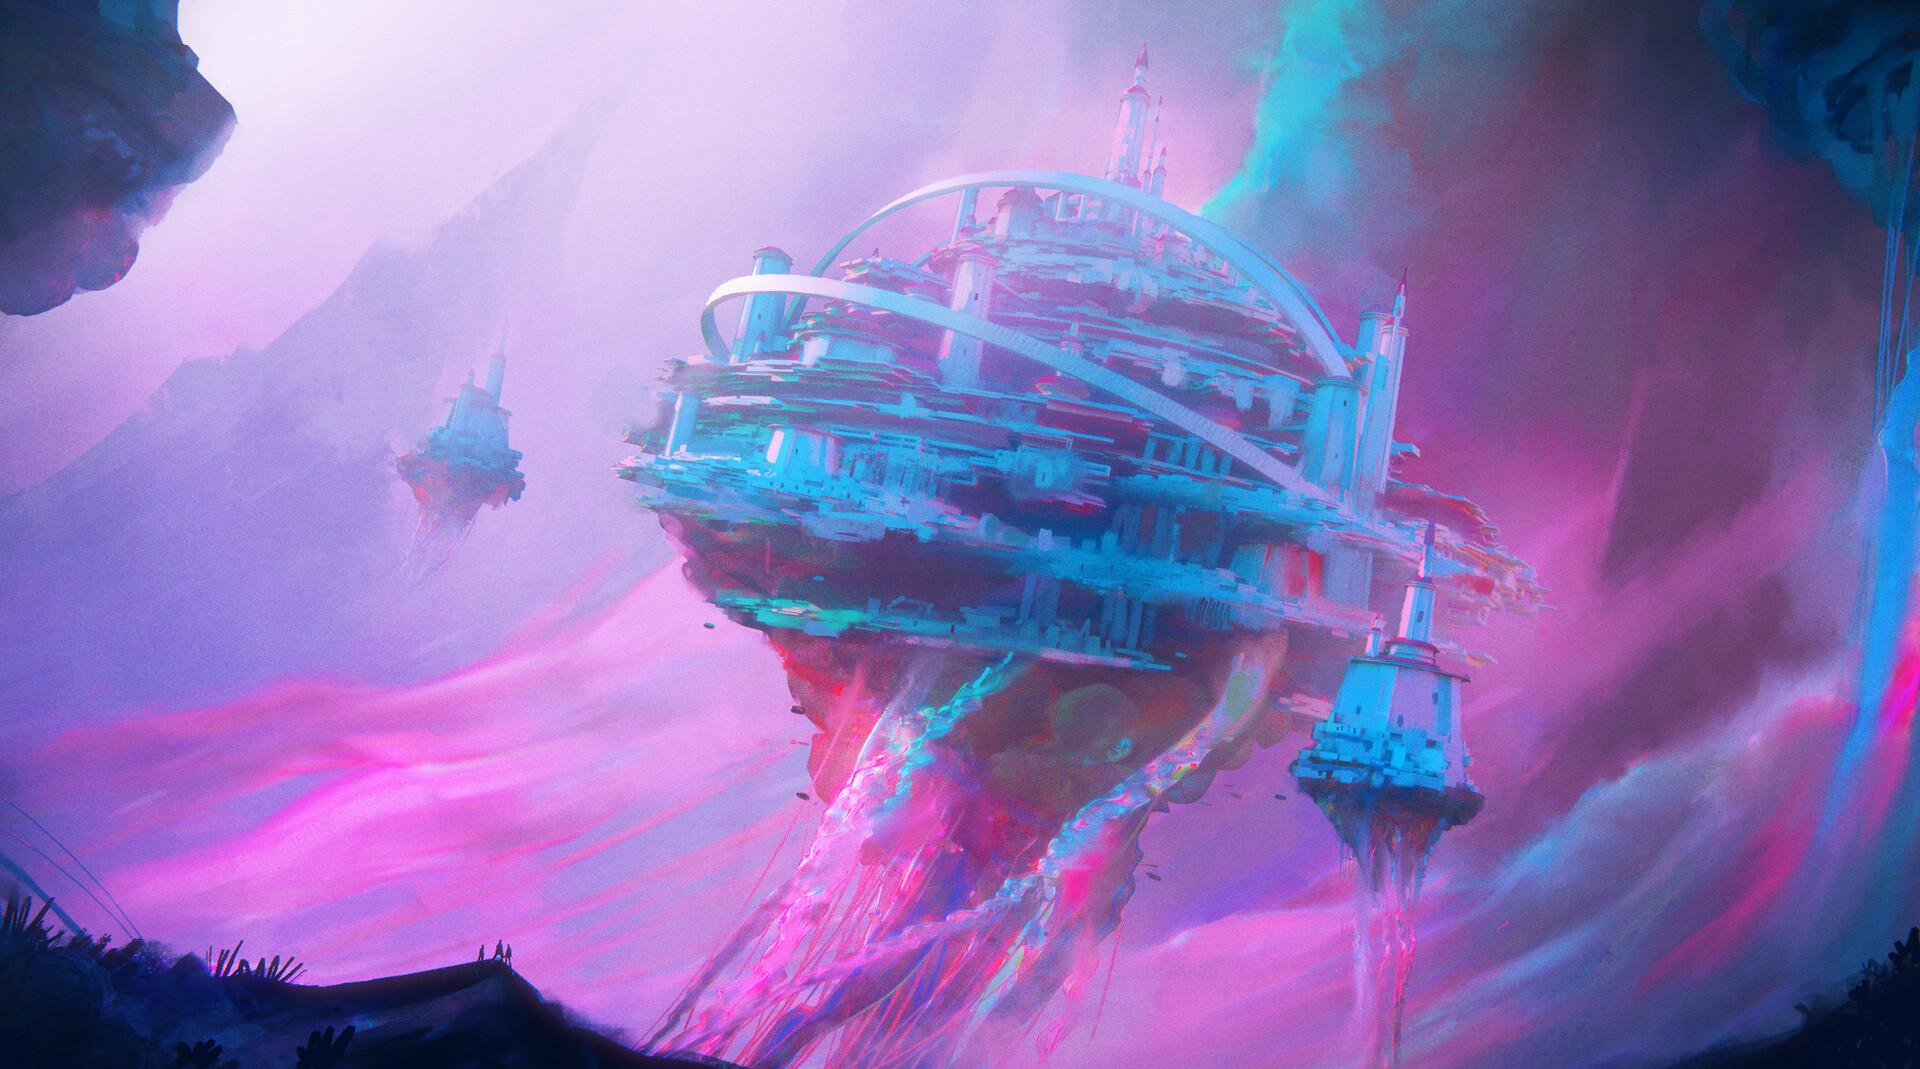 Leon tukker jellyfishscene sketch2